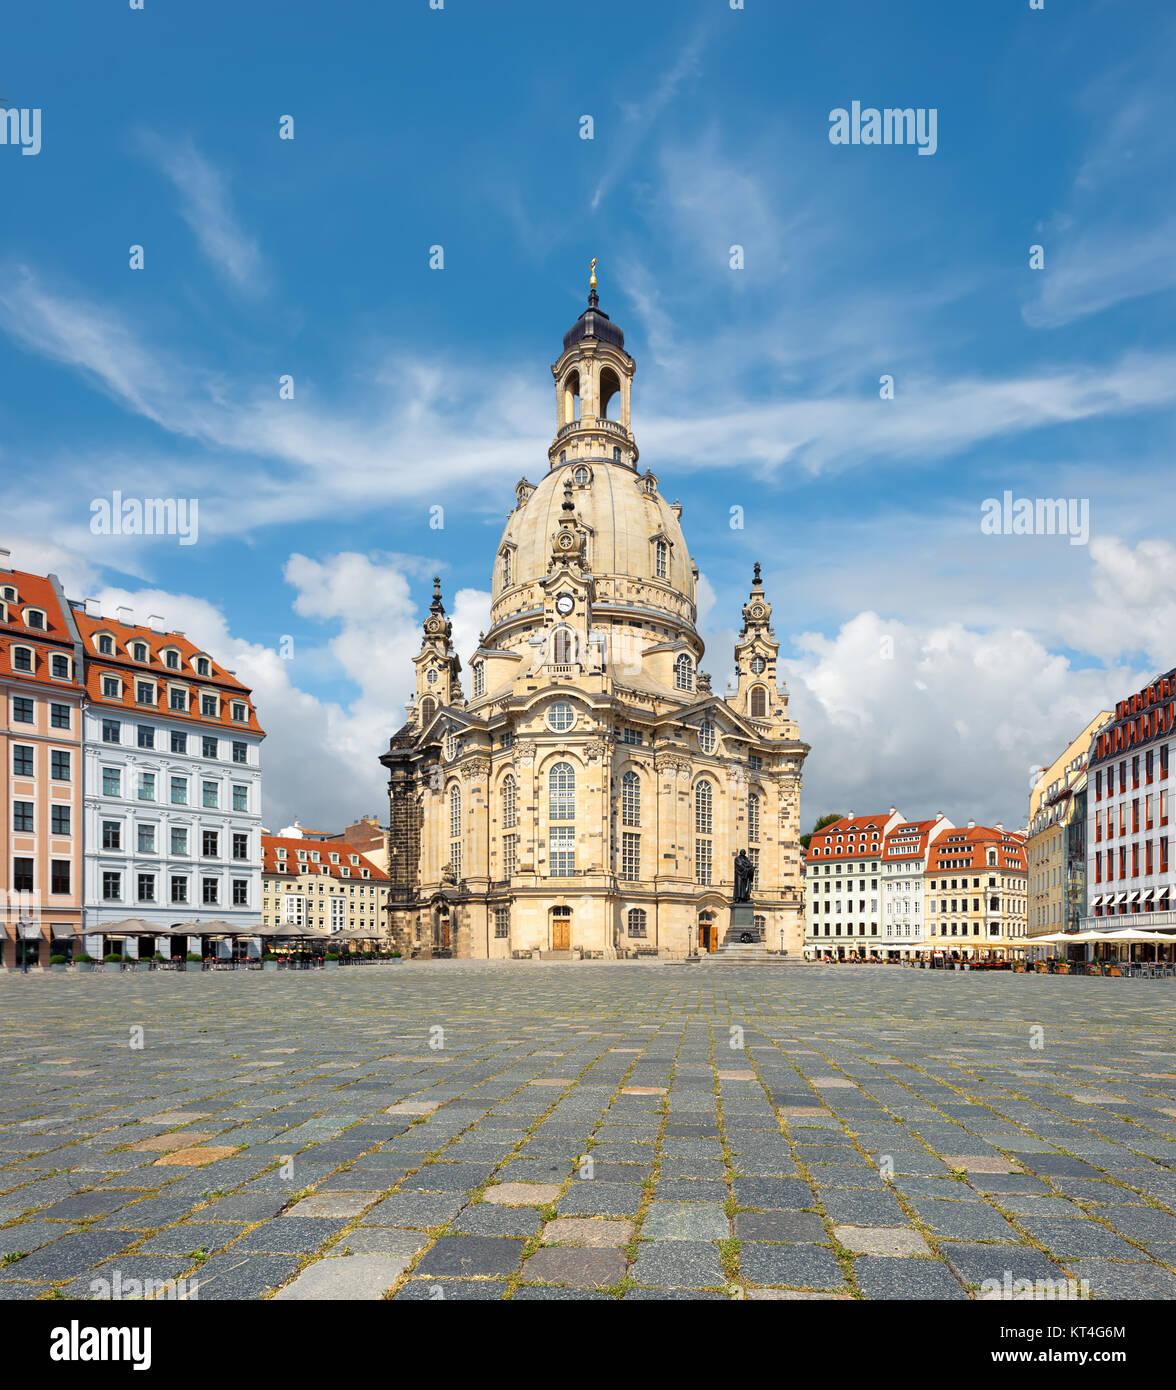 Frauenkirche in Dresden, Saxony, Germany, tilt-shift panoramic image Stock Photo